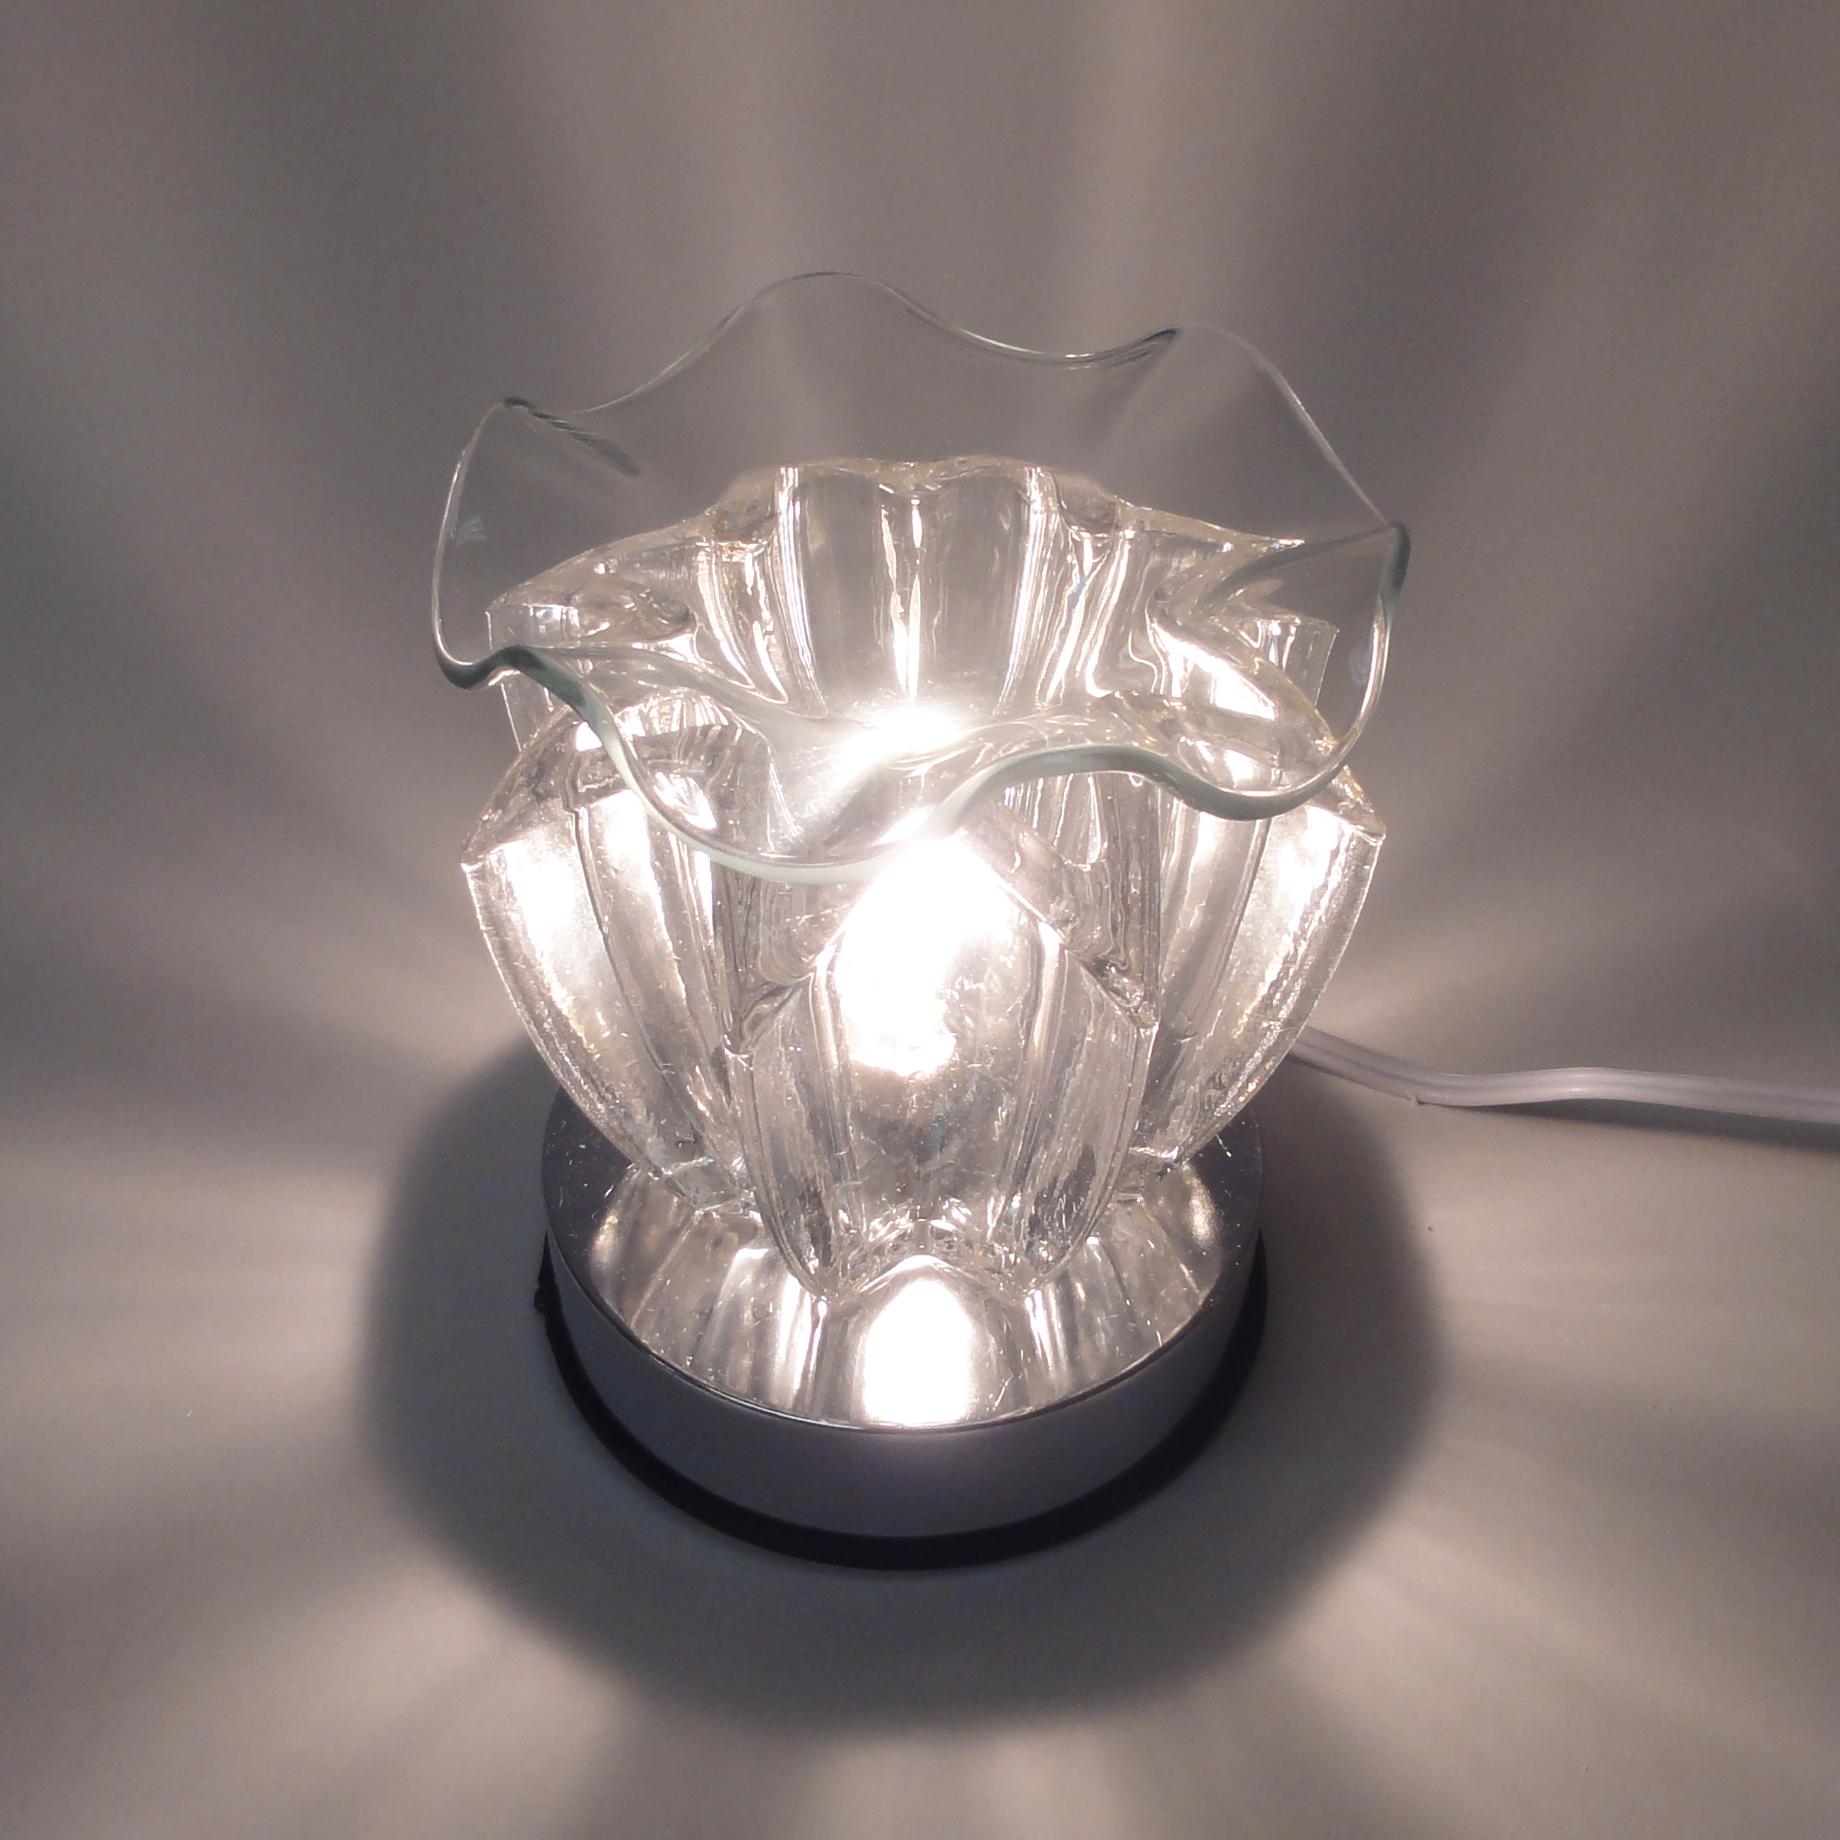 electric glass touch lamp essential oil diffuser oil burner tart. Black Bedroom Furniture Sets. Home Design Ideas